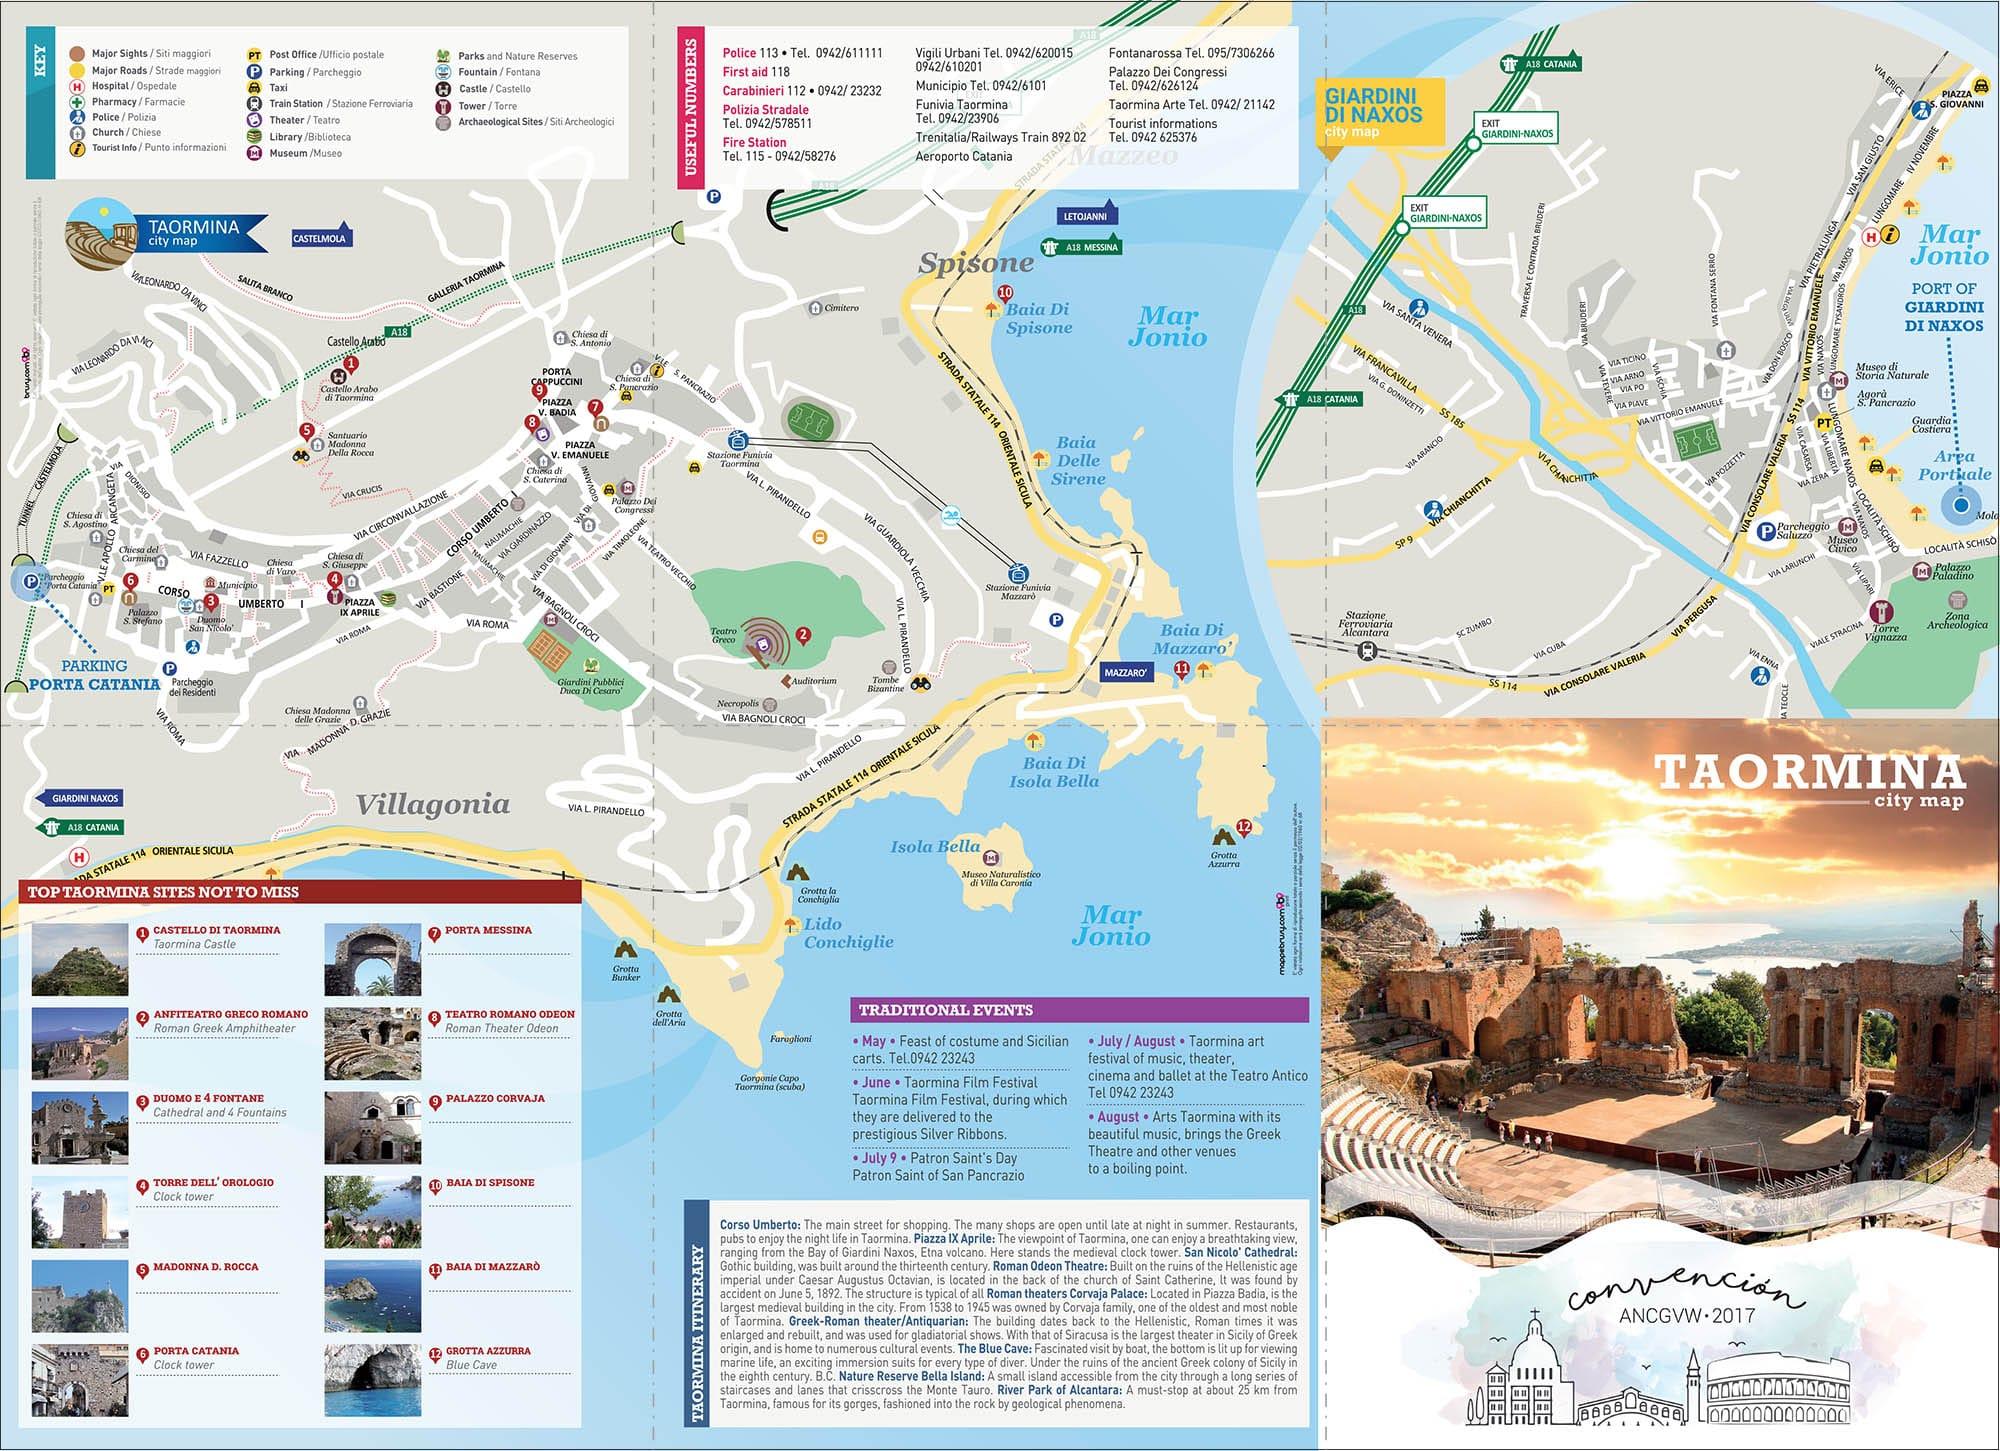 Cartina Geografica Sicilia Taormina.Abercrombie Brusy Personalizzata Mappa A3 Di Taormina E